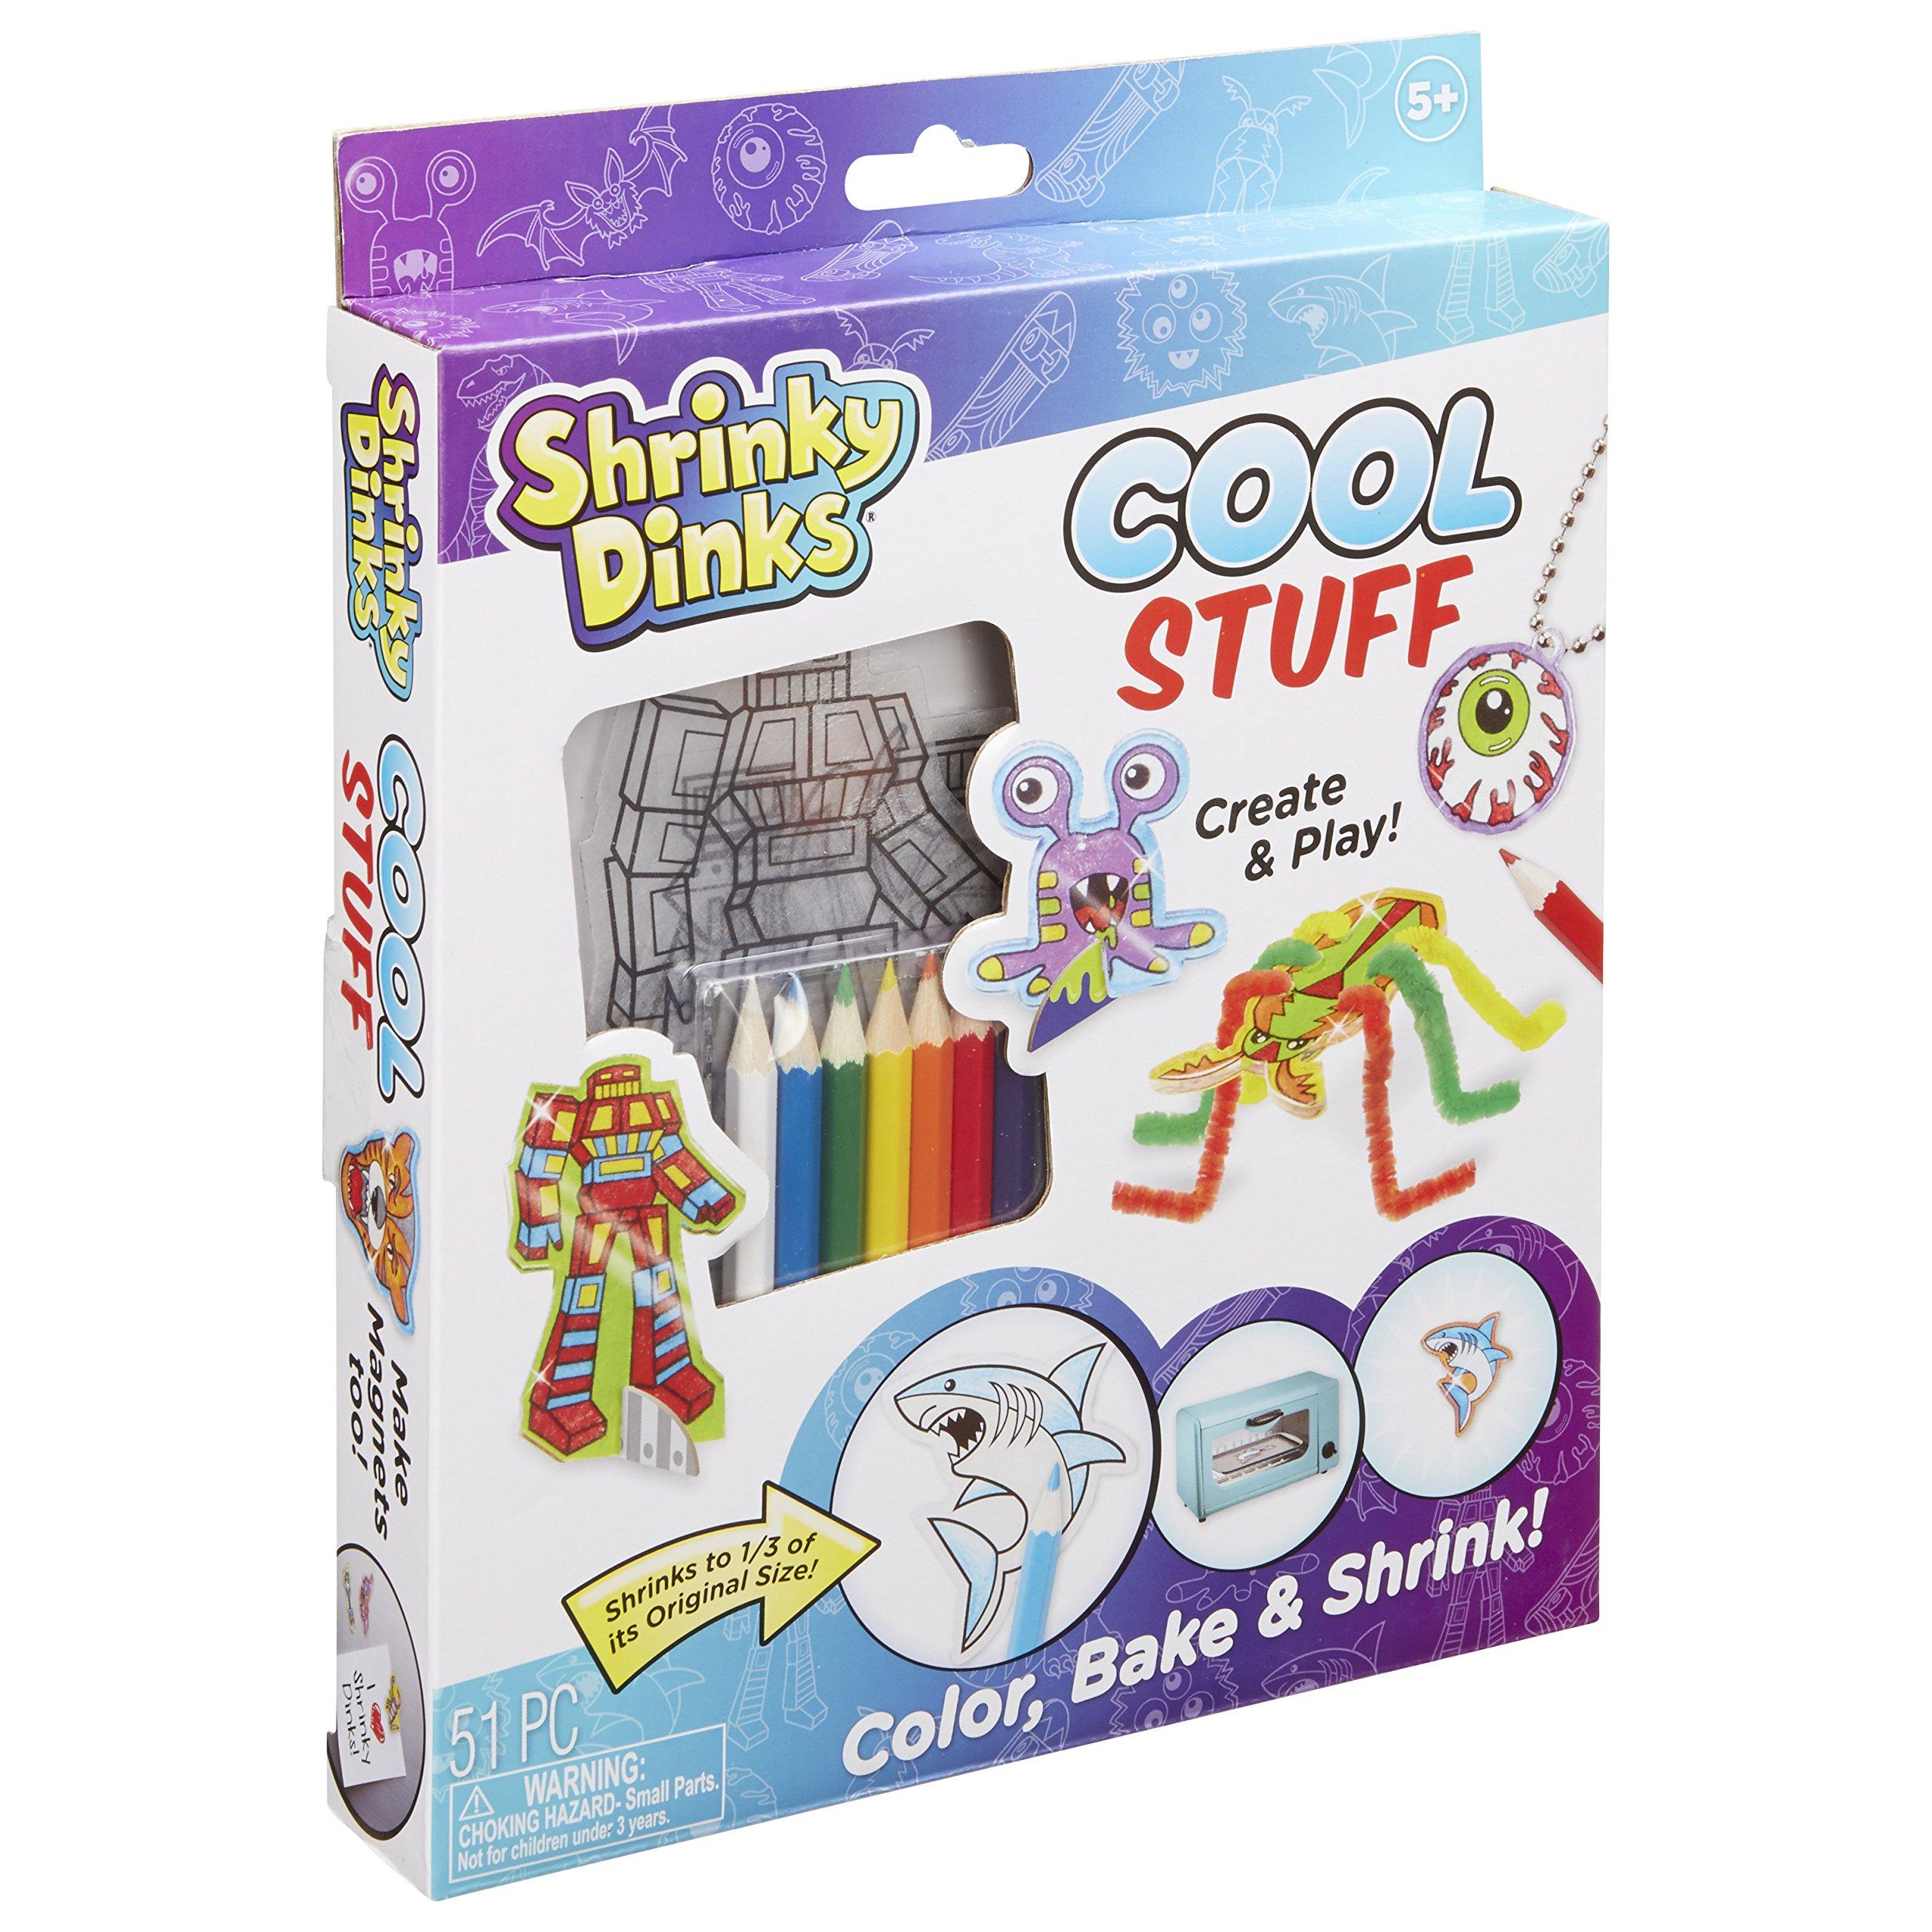 Shrinky Dinks Cool Stuff Activity Set Kids Art and Craft Activity